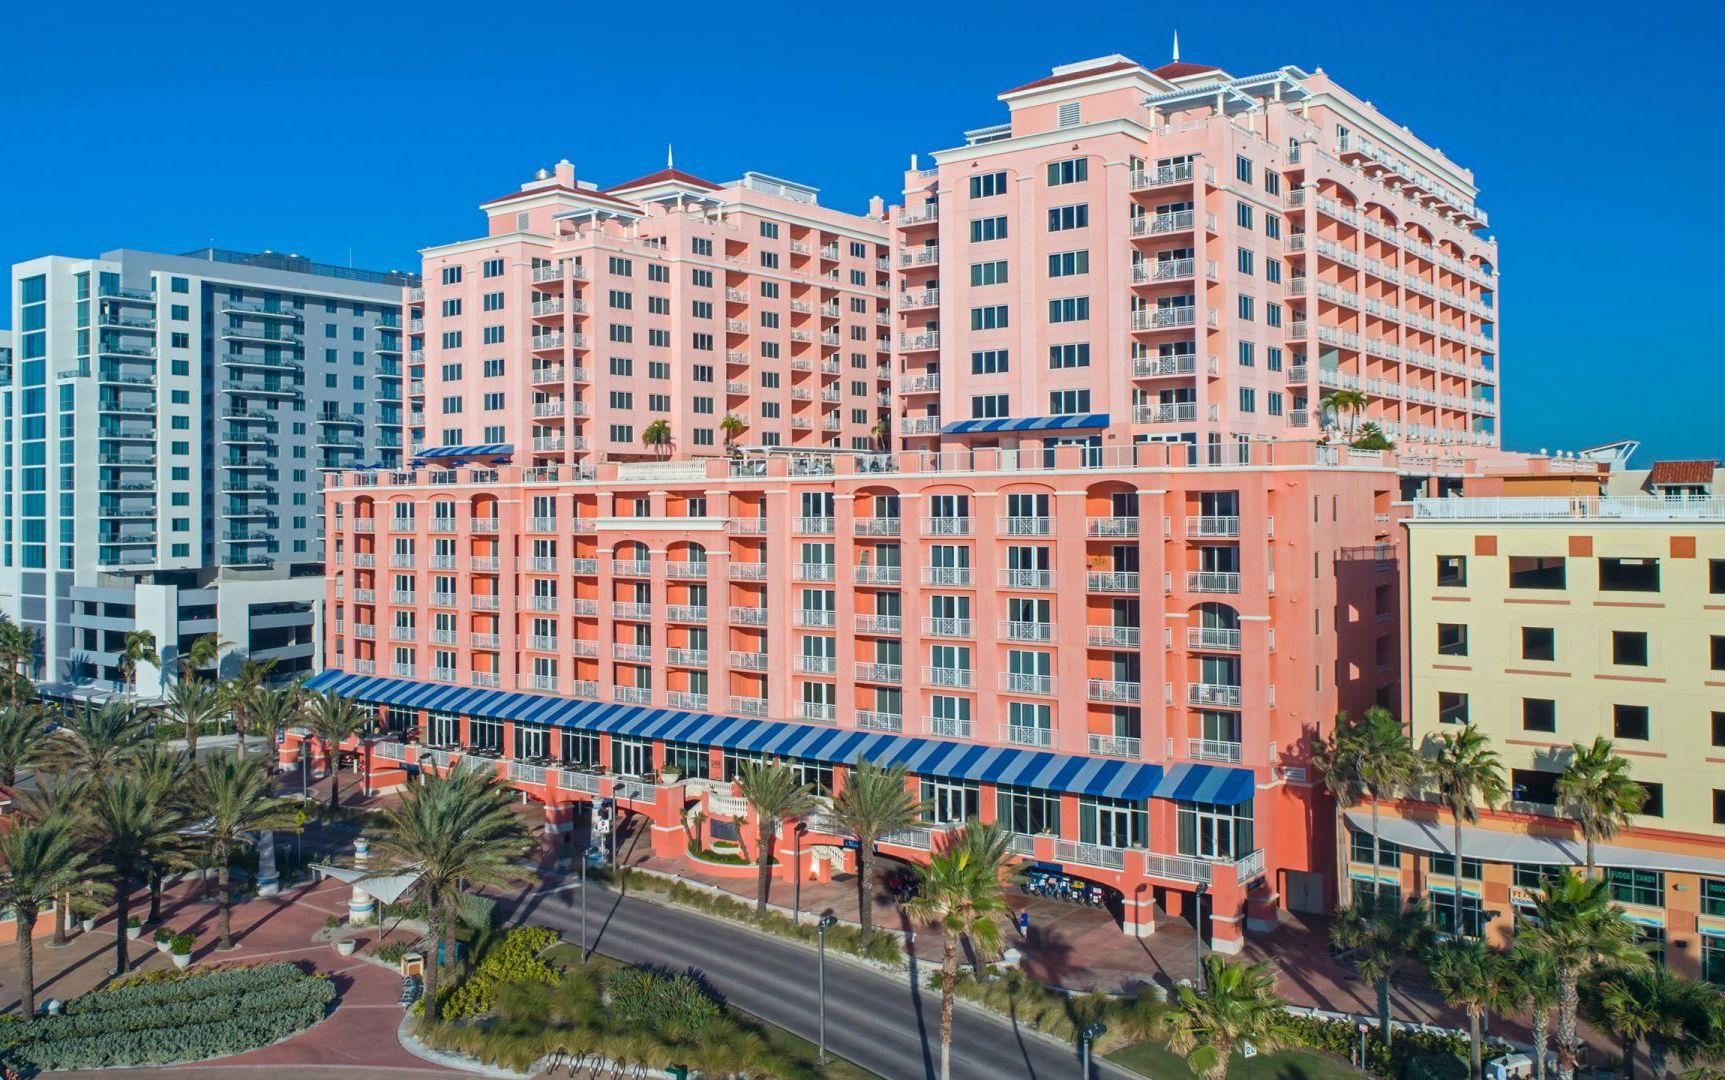 Aqualea Resort and Condos